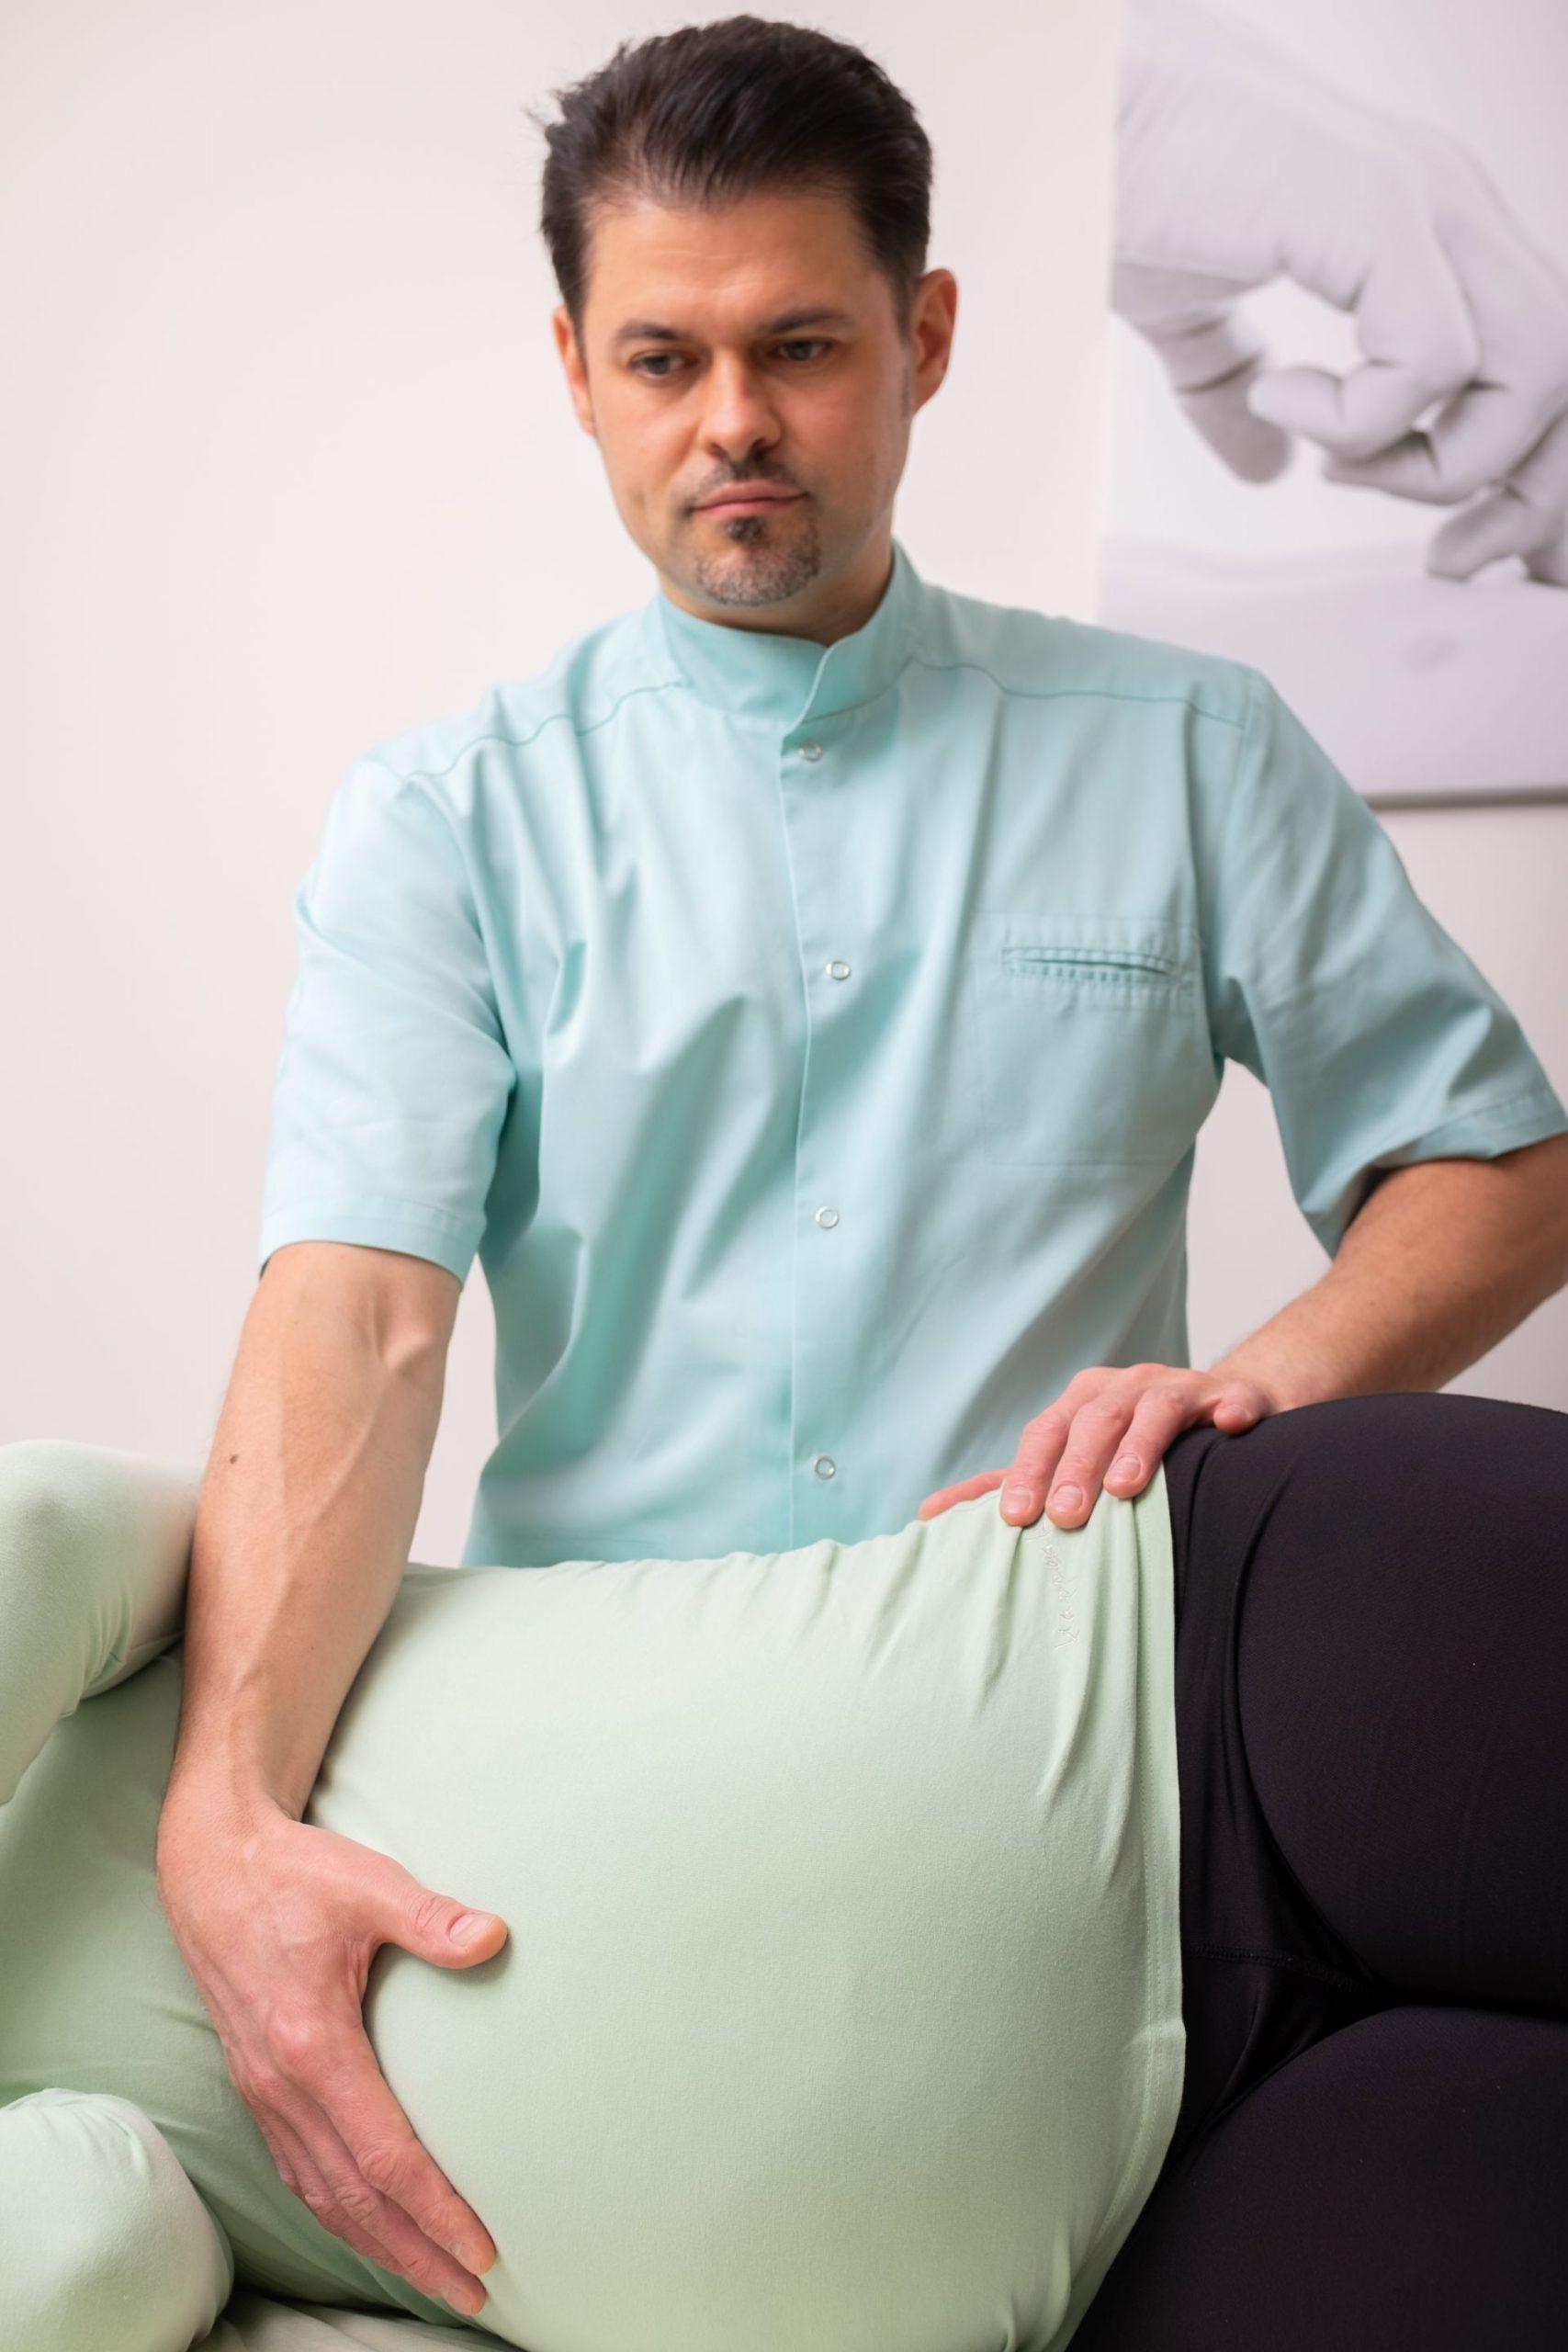 Osteopatine pagalba nesciosioms